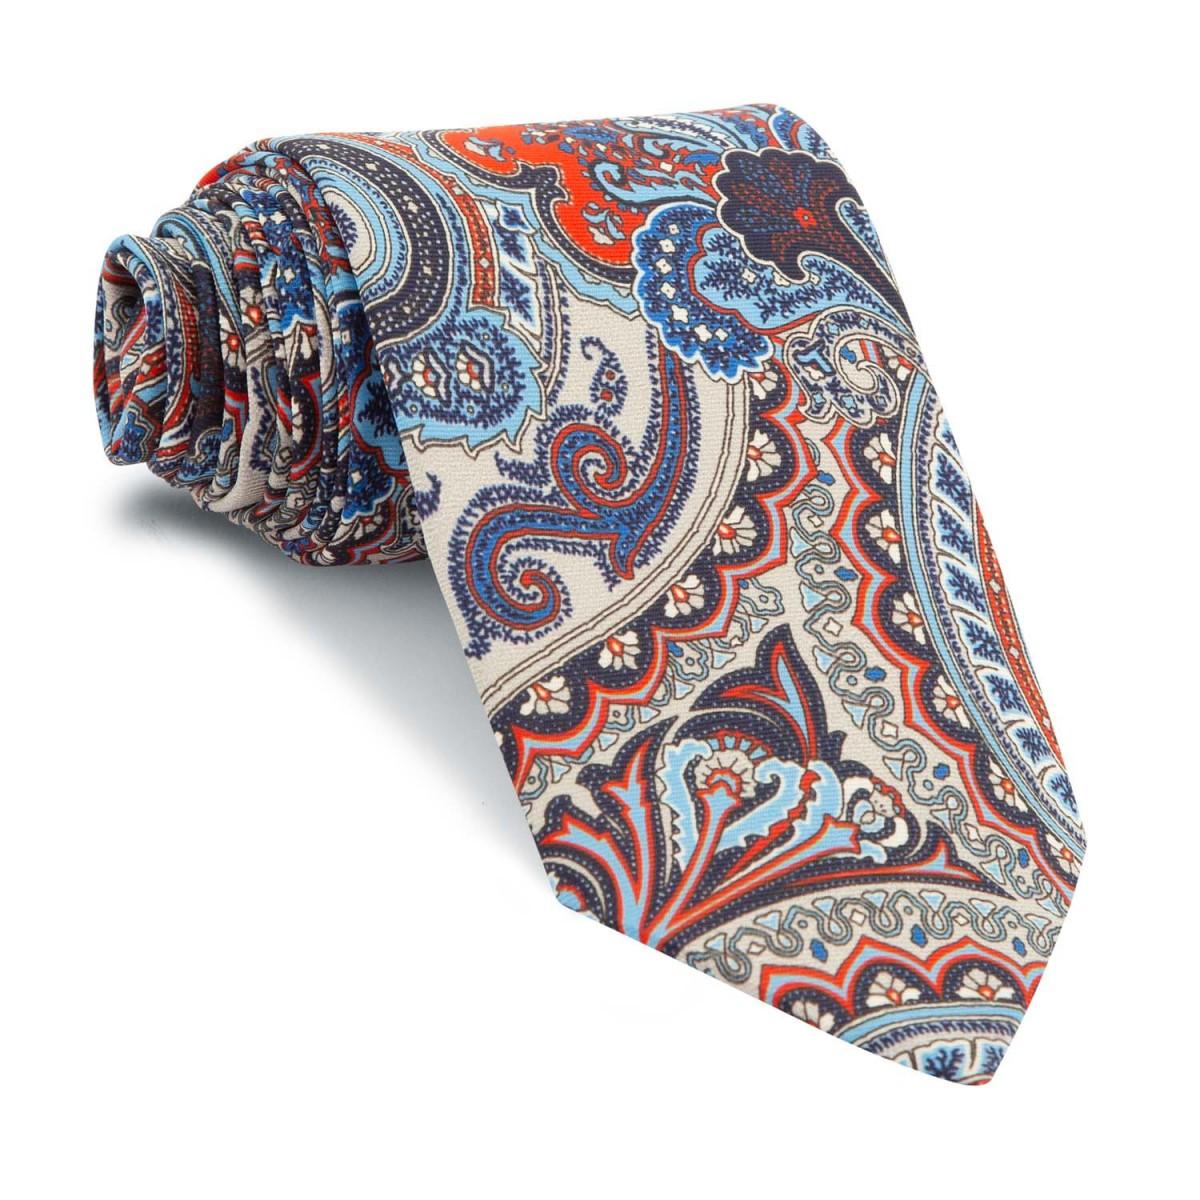 Corbata-Gris-Cachemires-Azules-y-Rojos